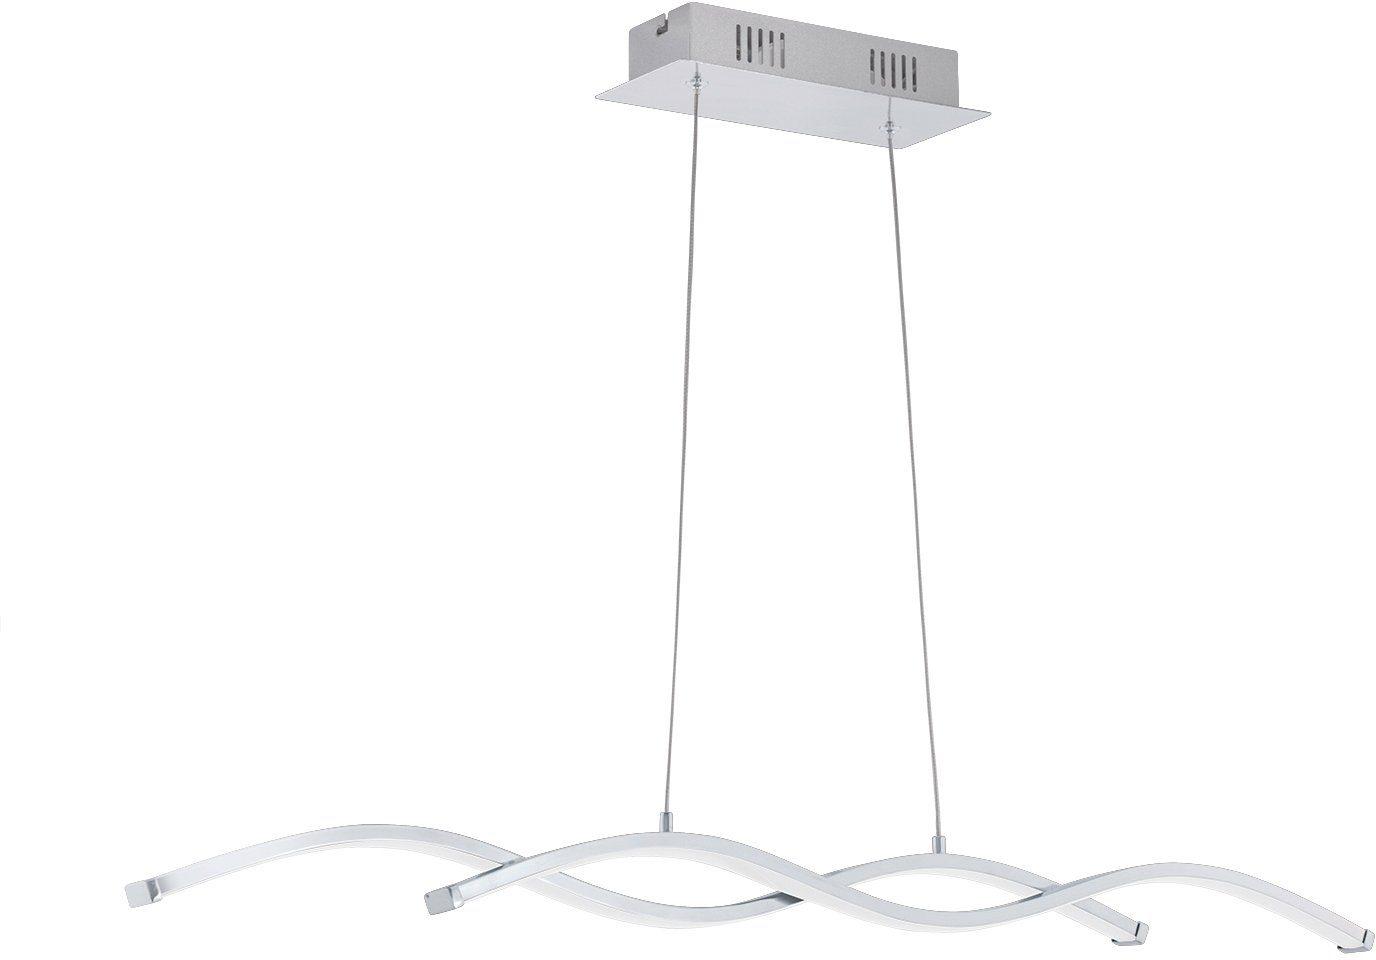 Eglo LED Pendelleuchte, 2flg., Länge 87 cm, »LASANA2«